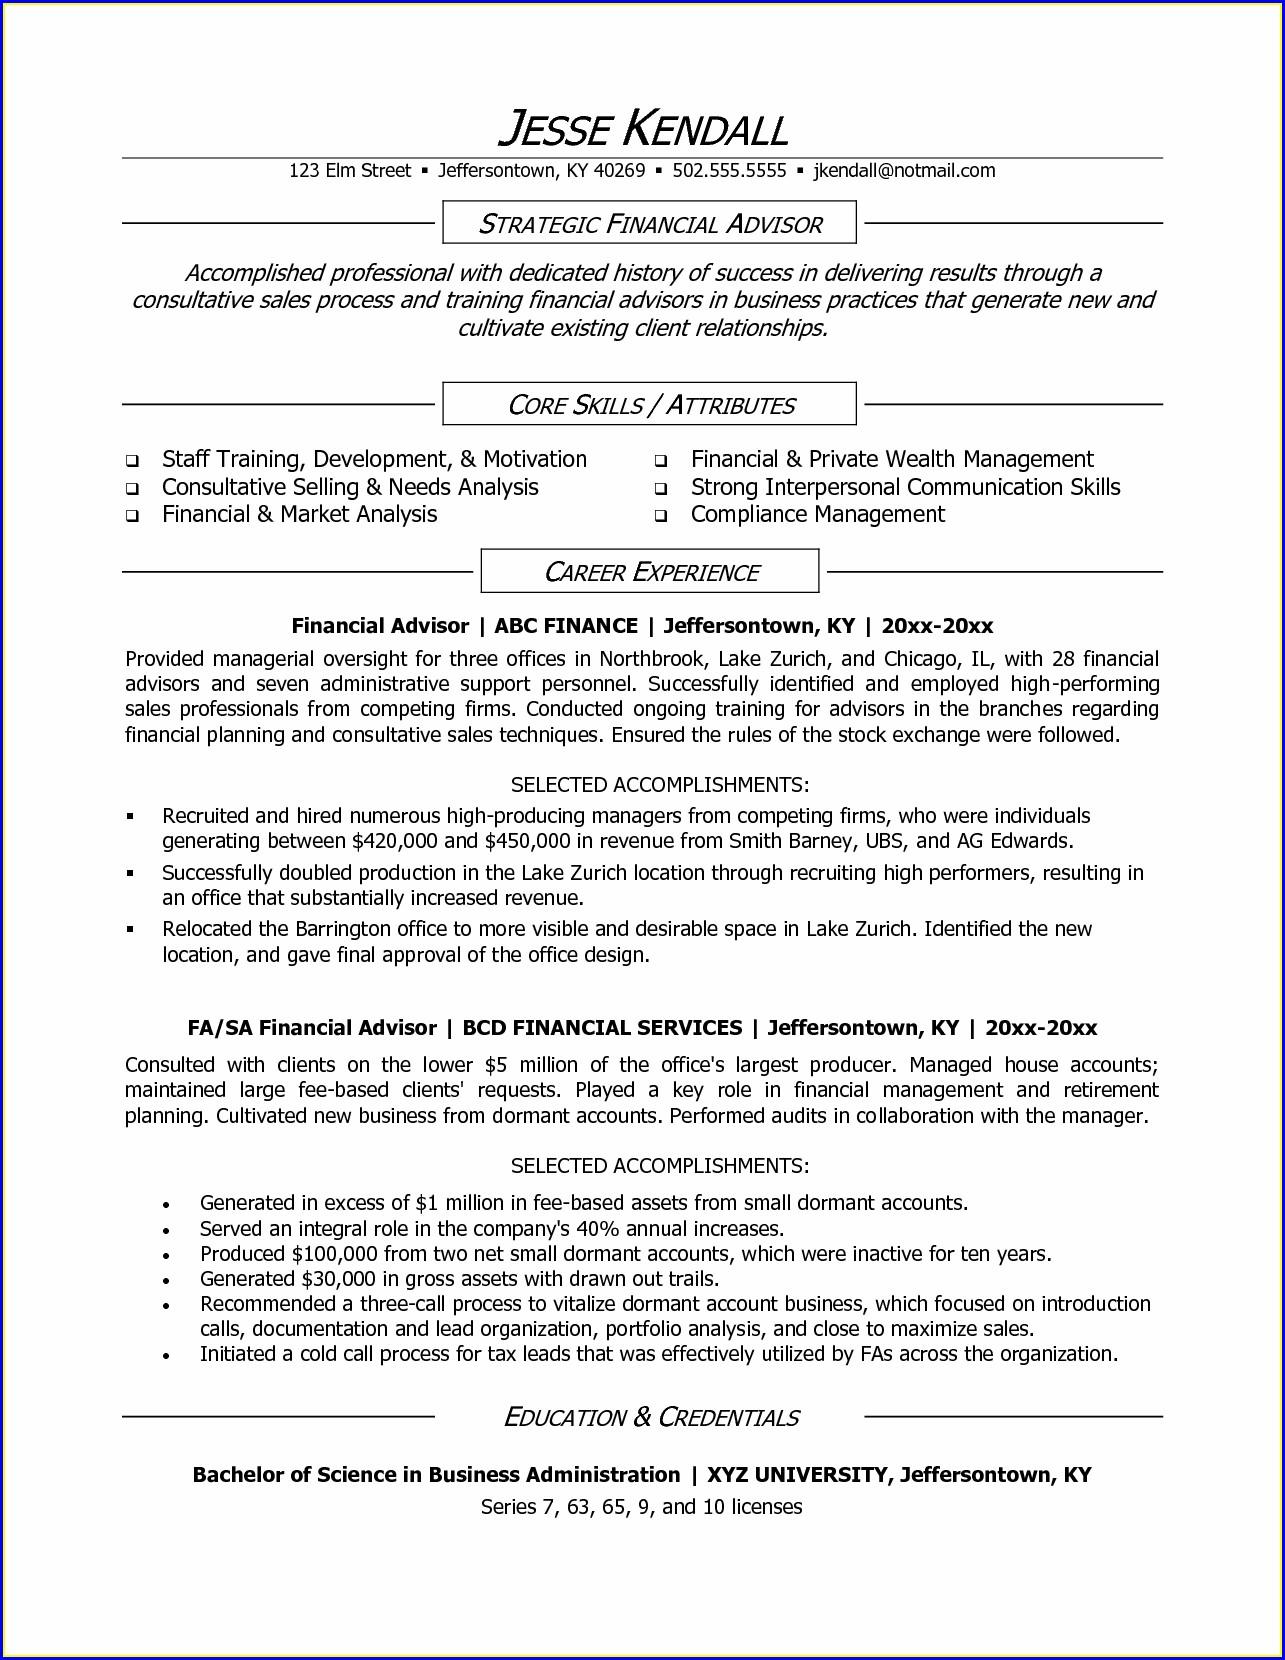 Certified Financial Planner Resume Sample